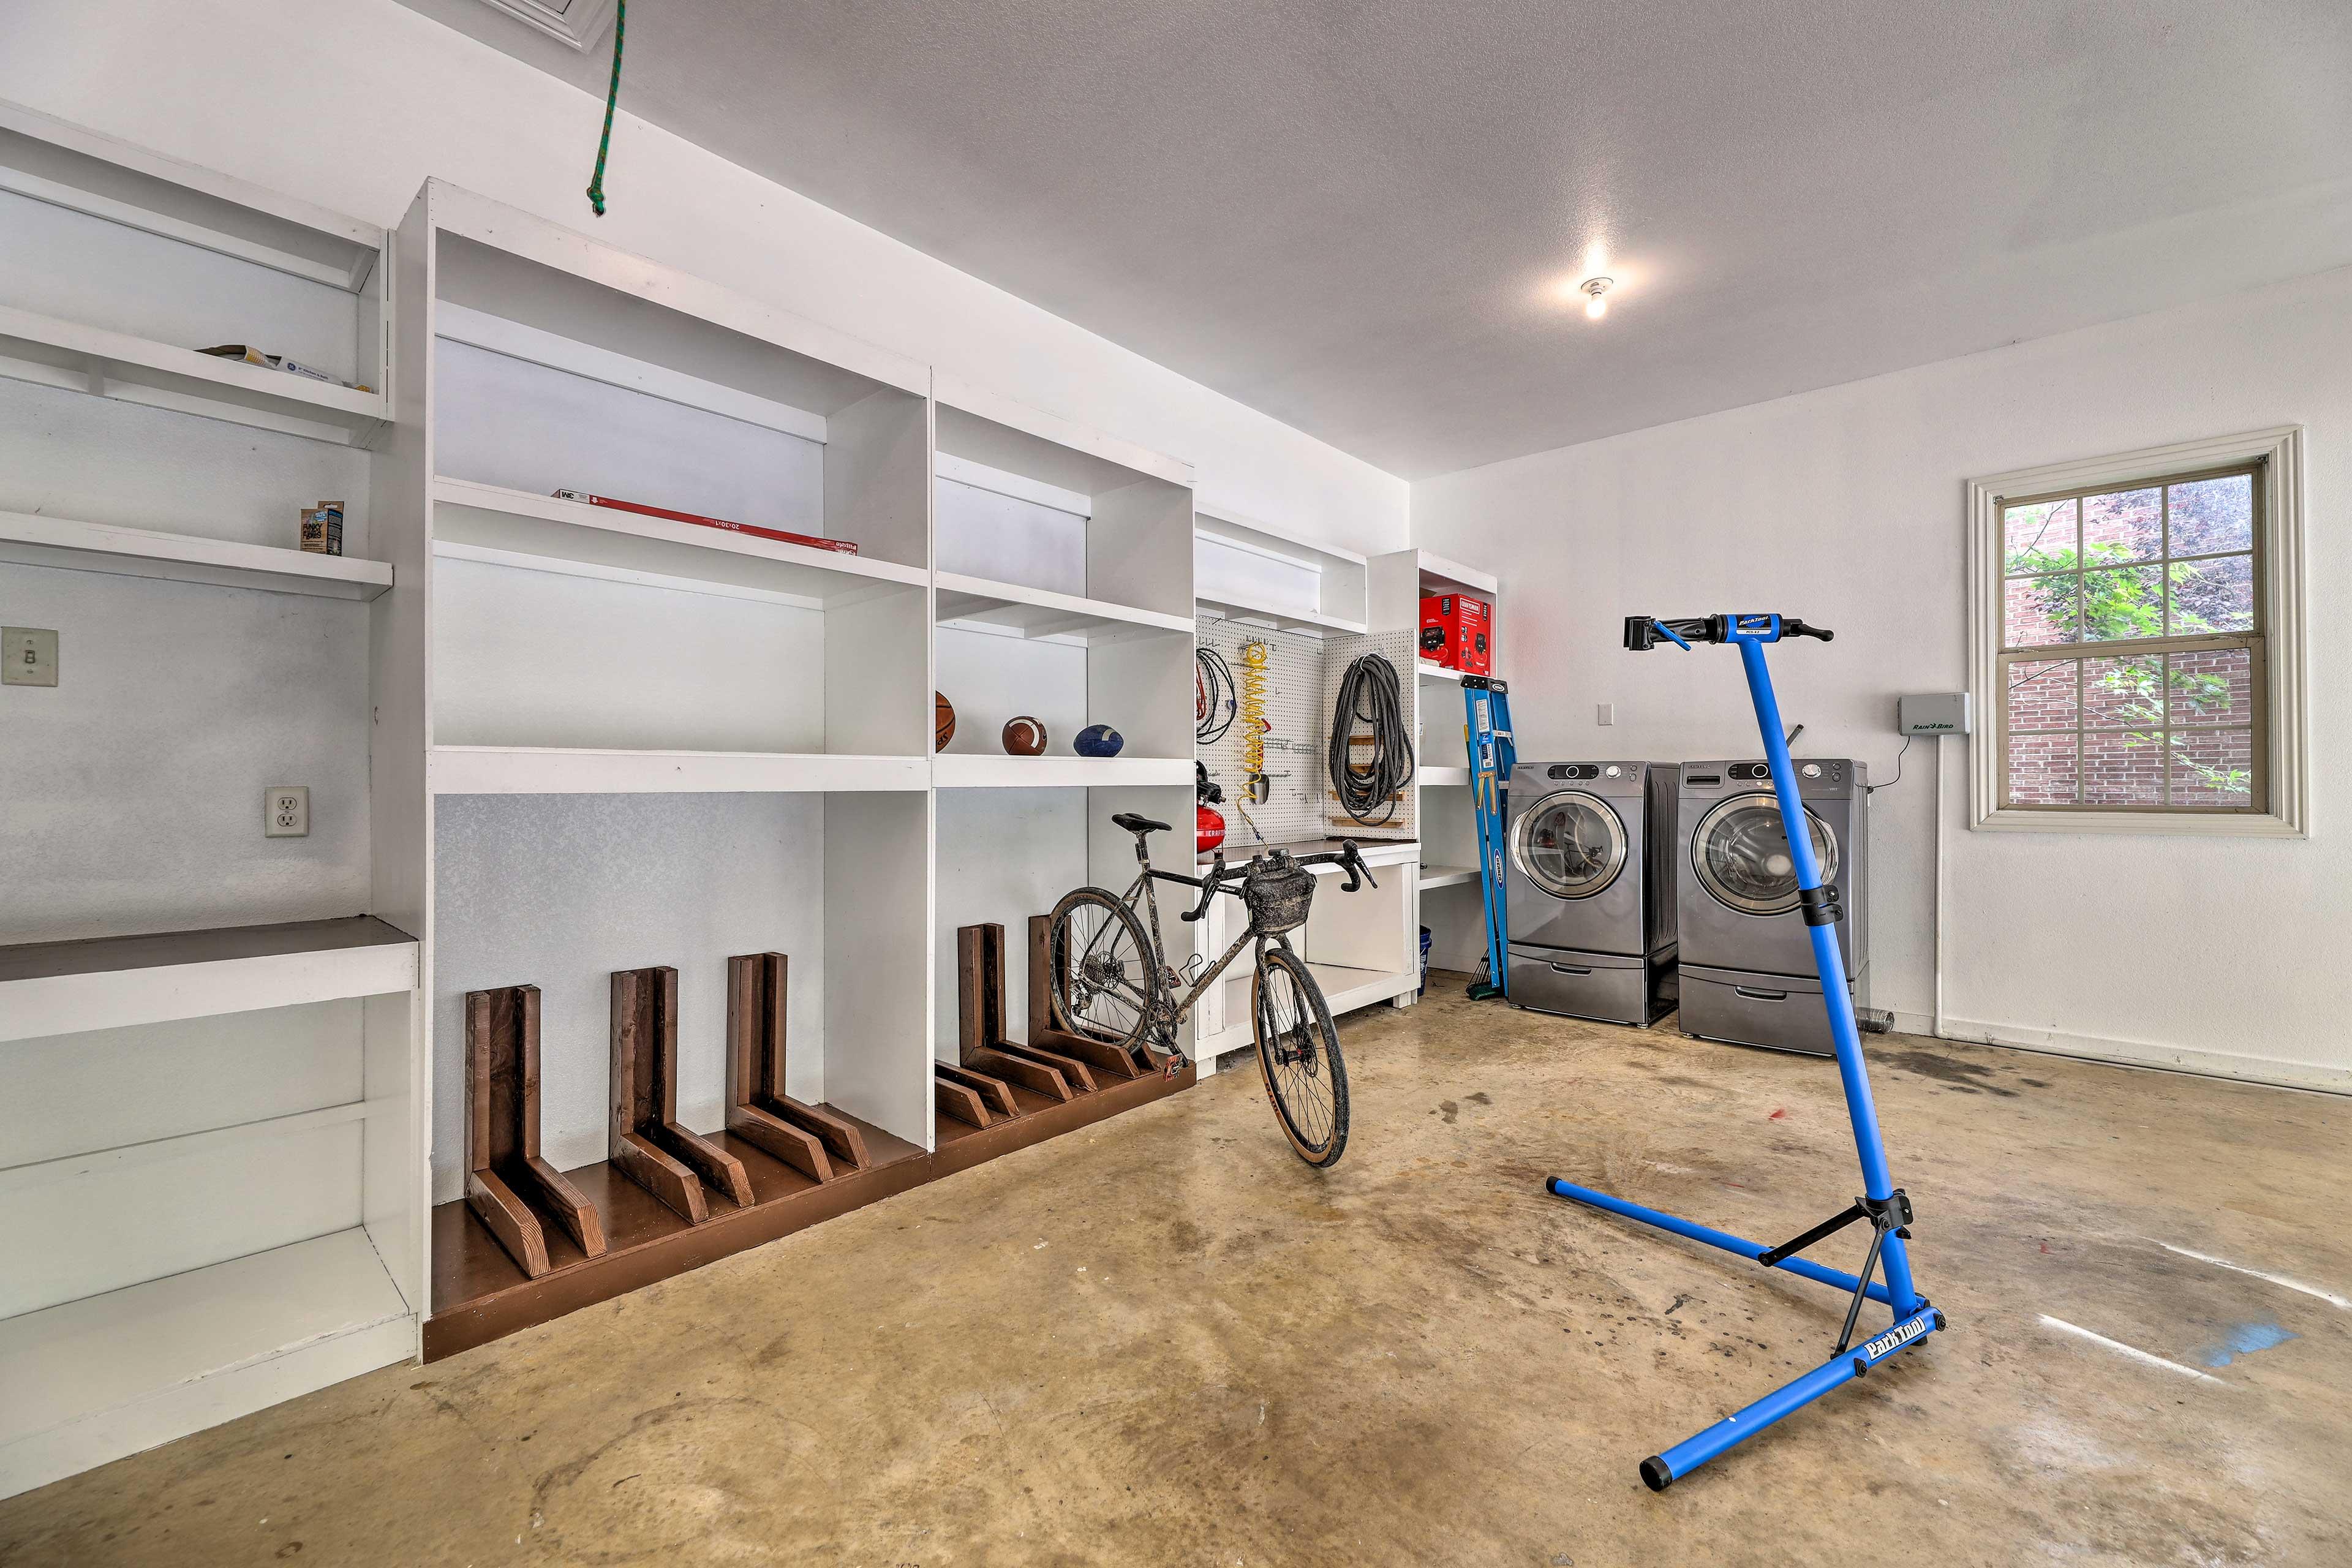 Garage   Air Compressor   Bike Work Stand   Bike Rack